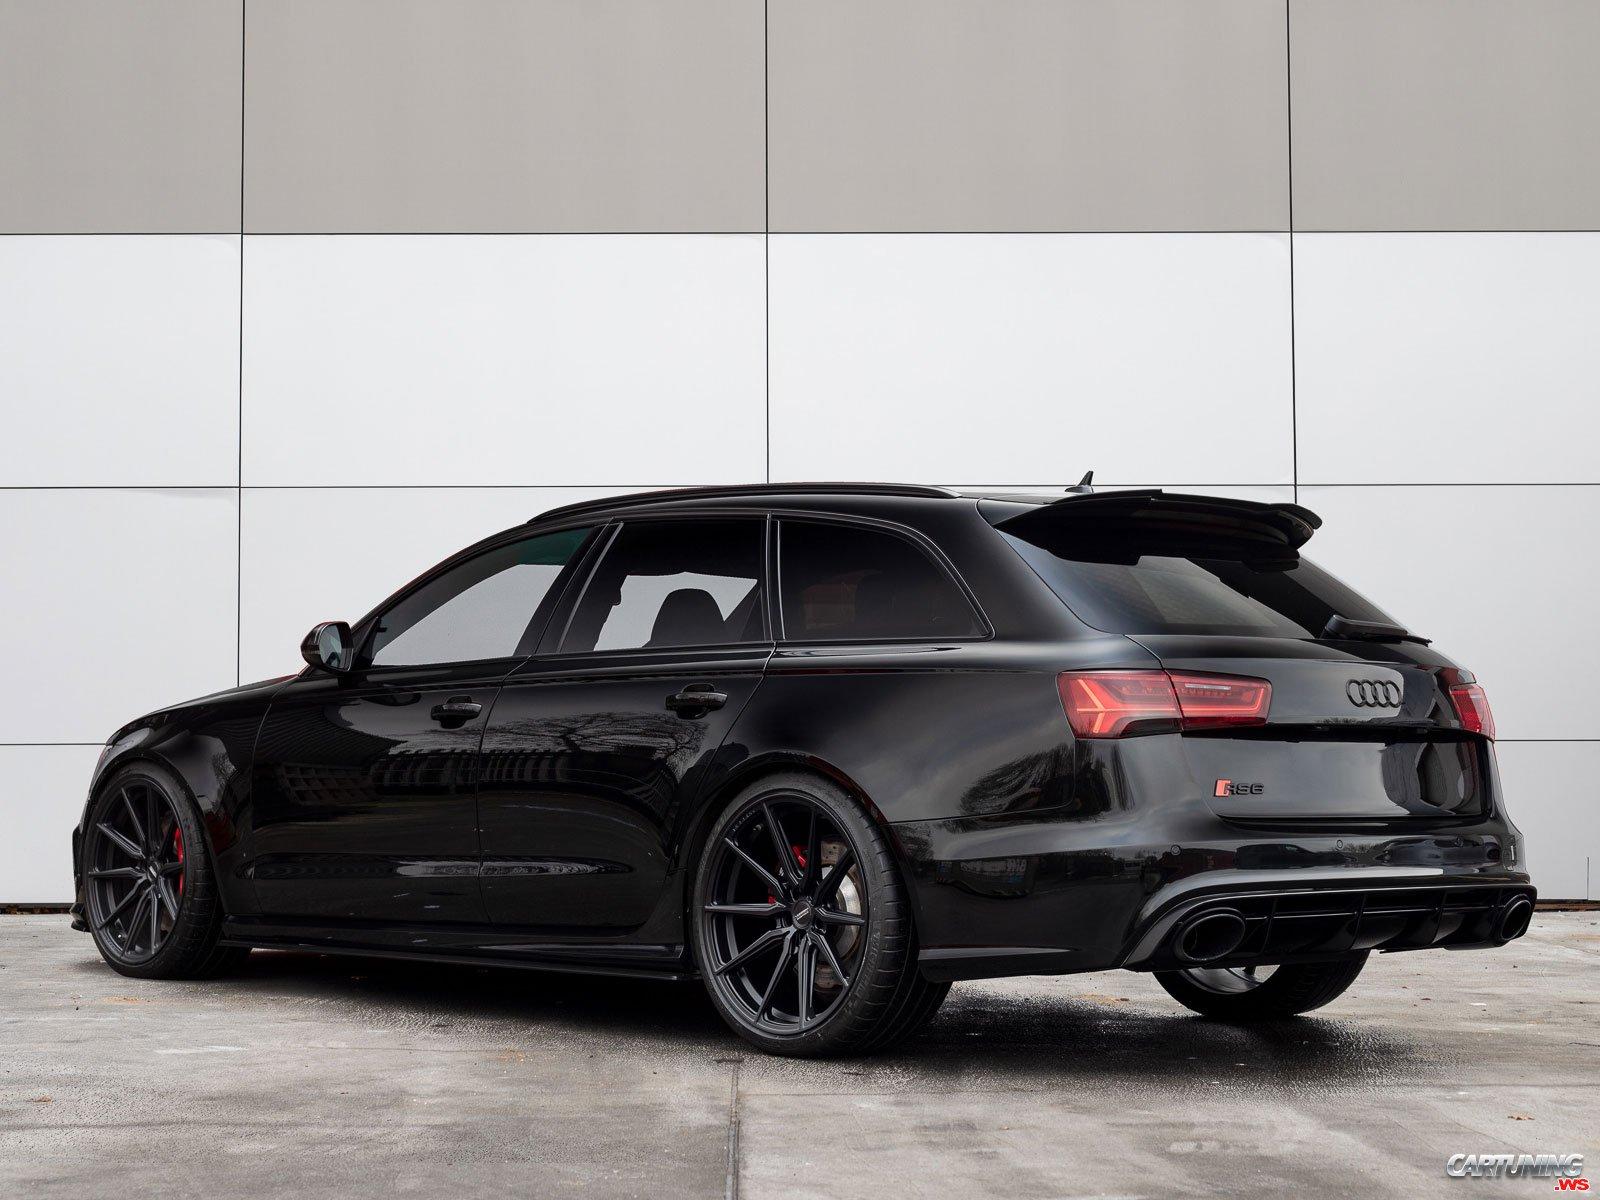 Tuning Audi Rs6 C7 Avant Back